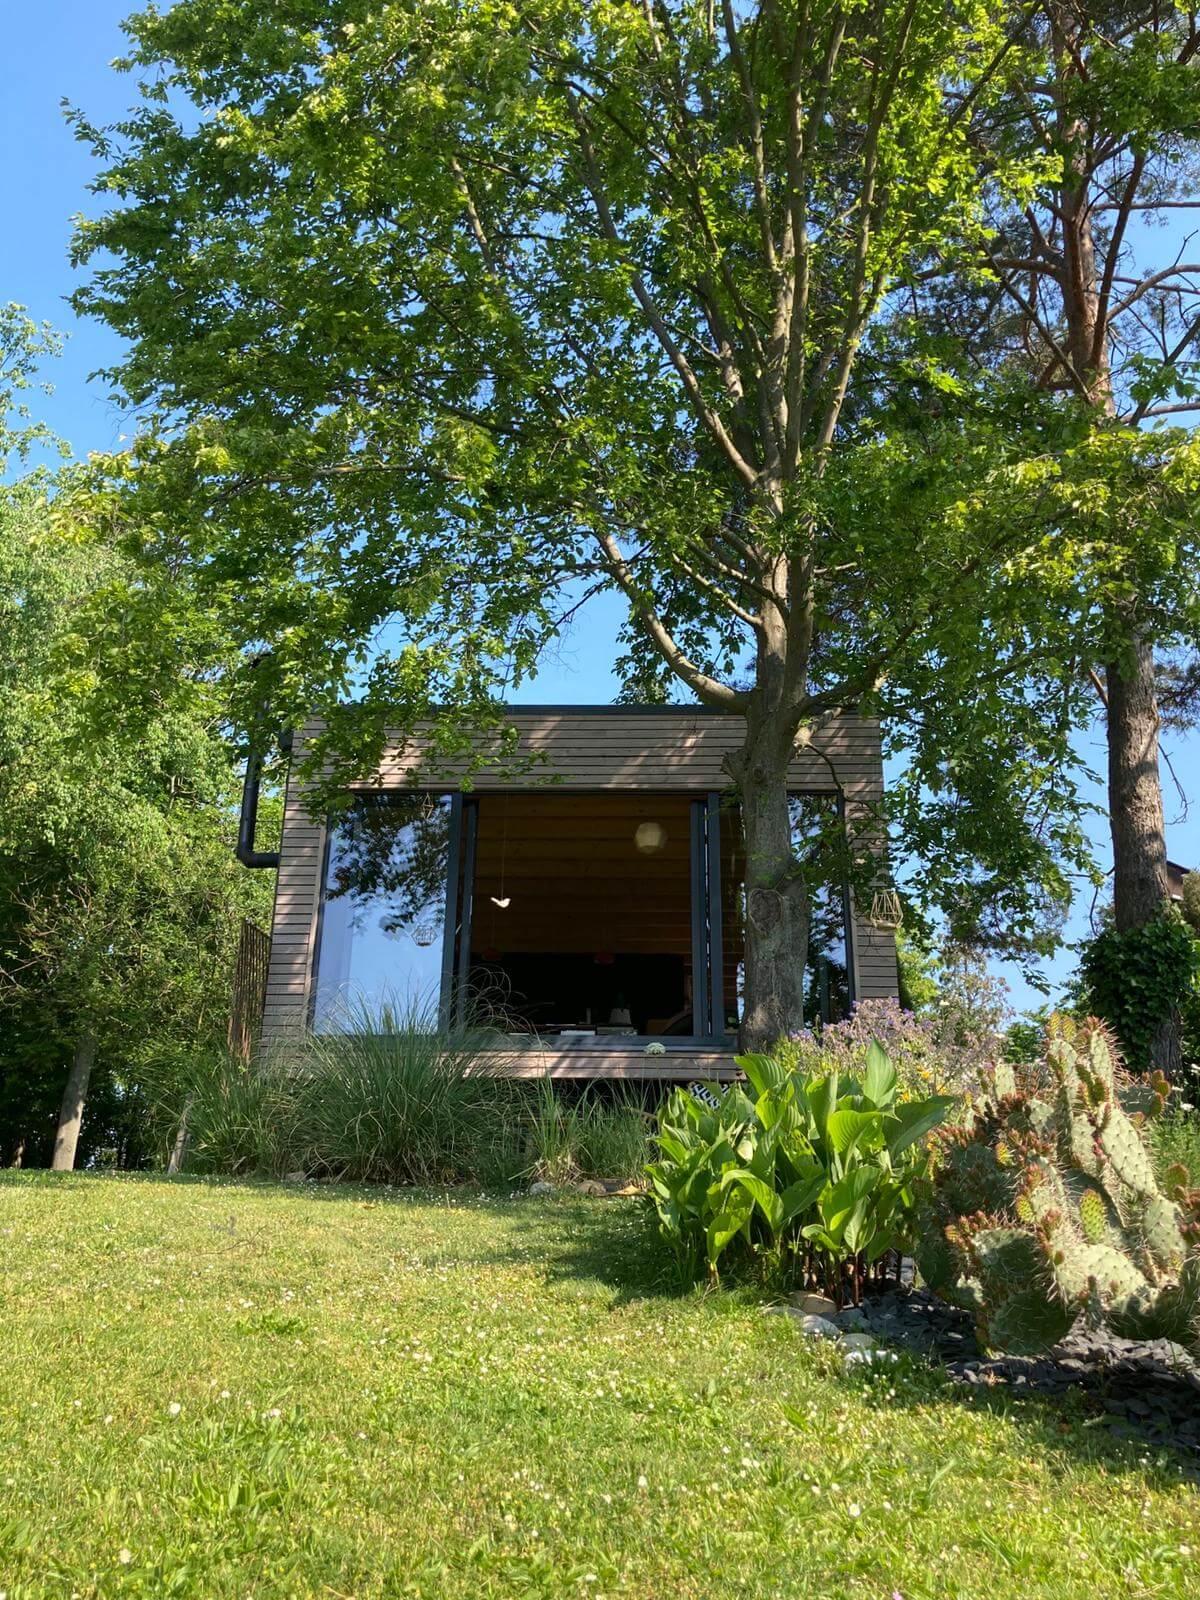 mobiles-chalet-norwegen-mobiles-tiny-house-13